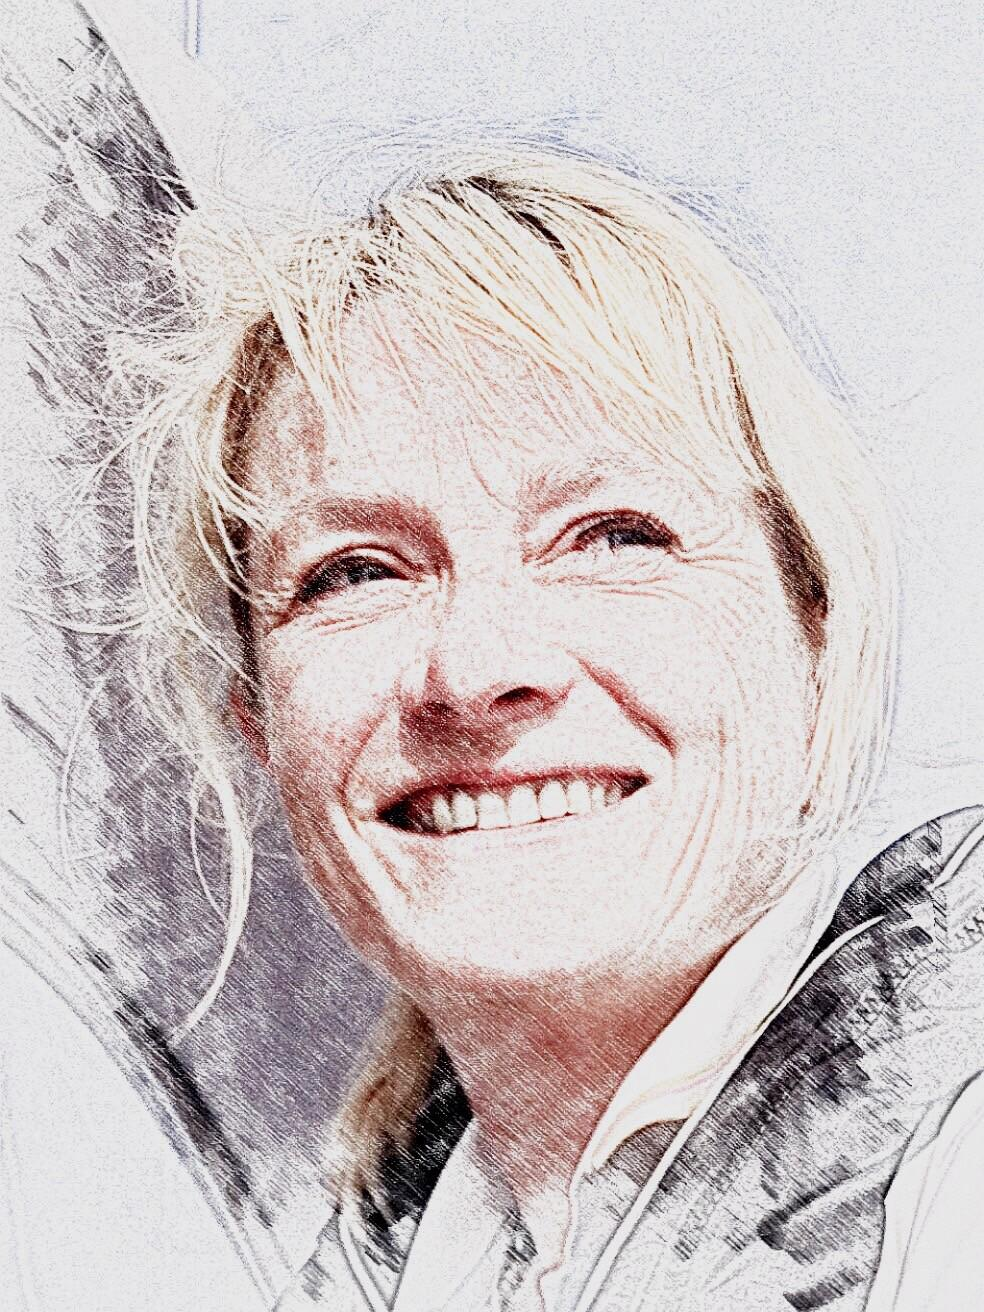 Bettina Frenzel